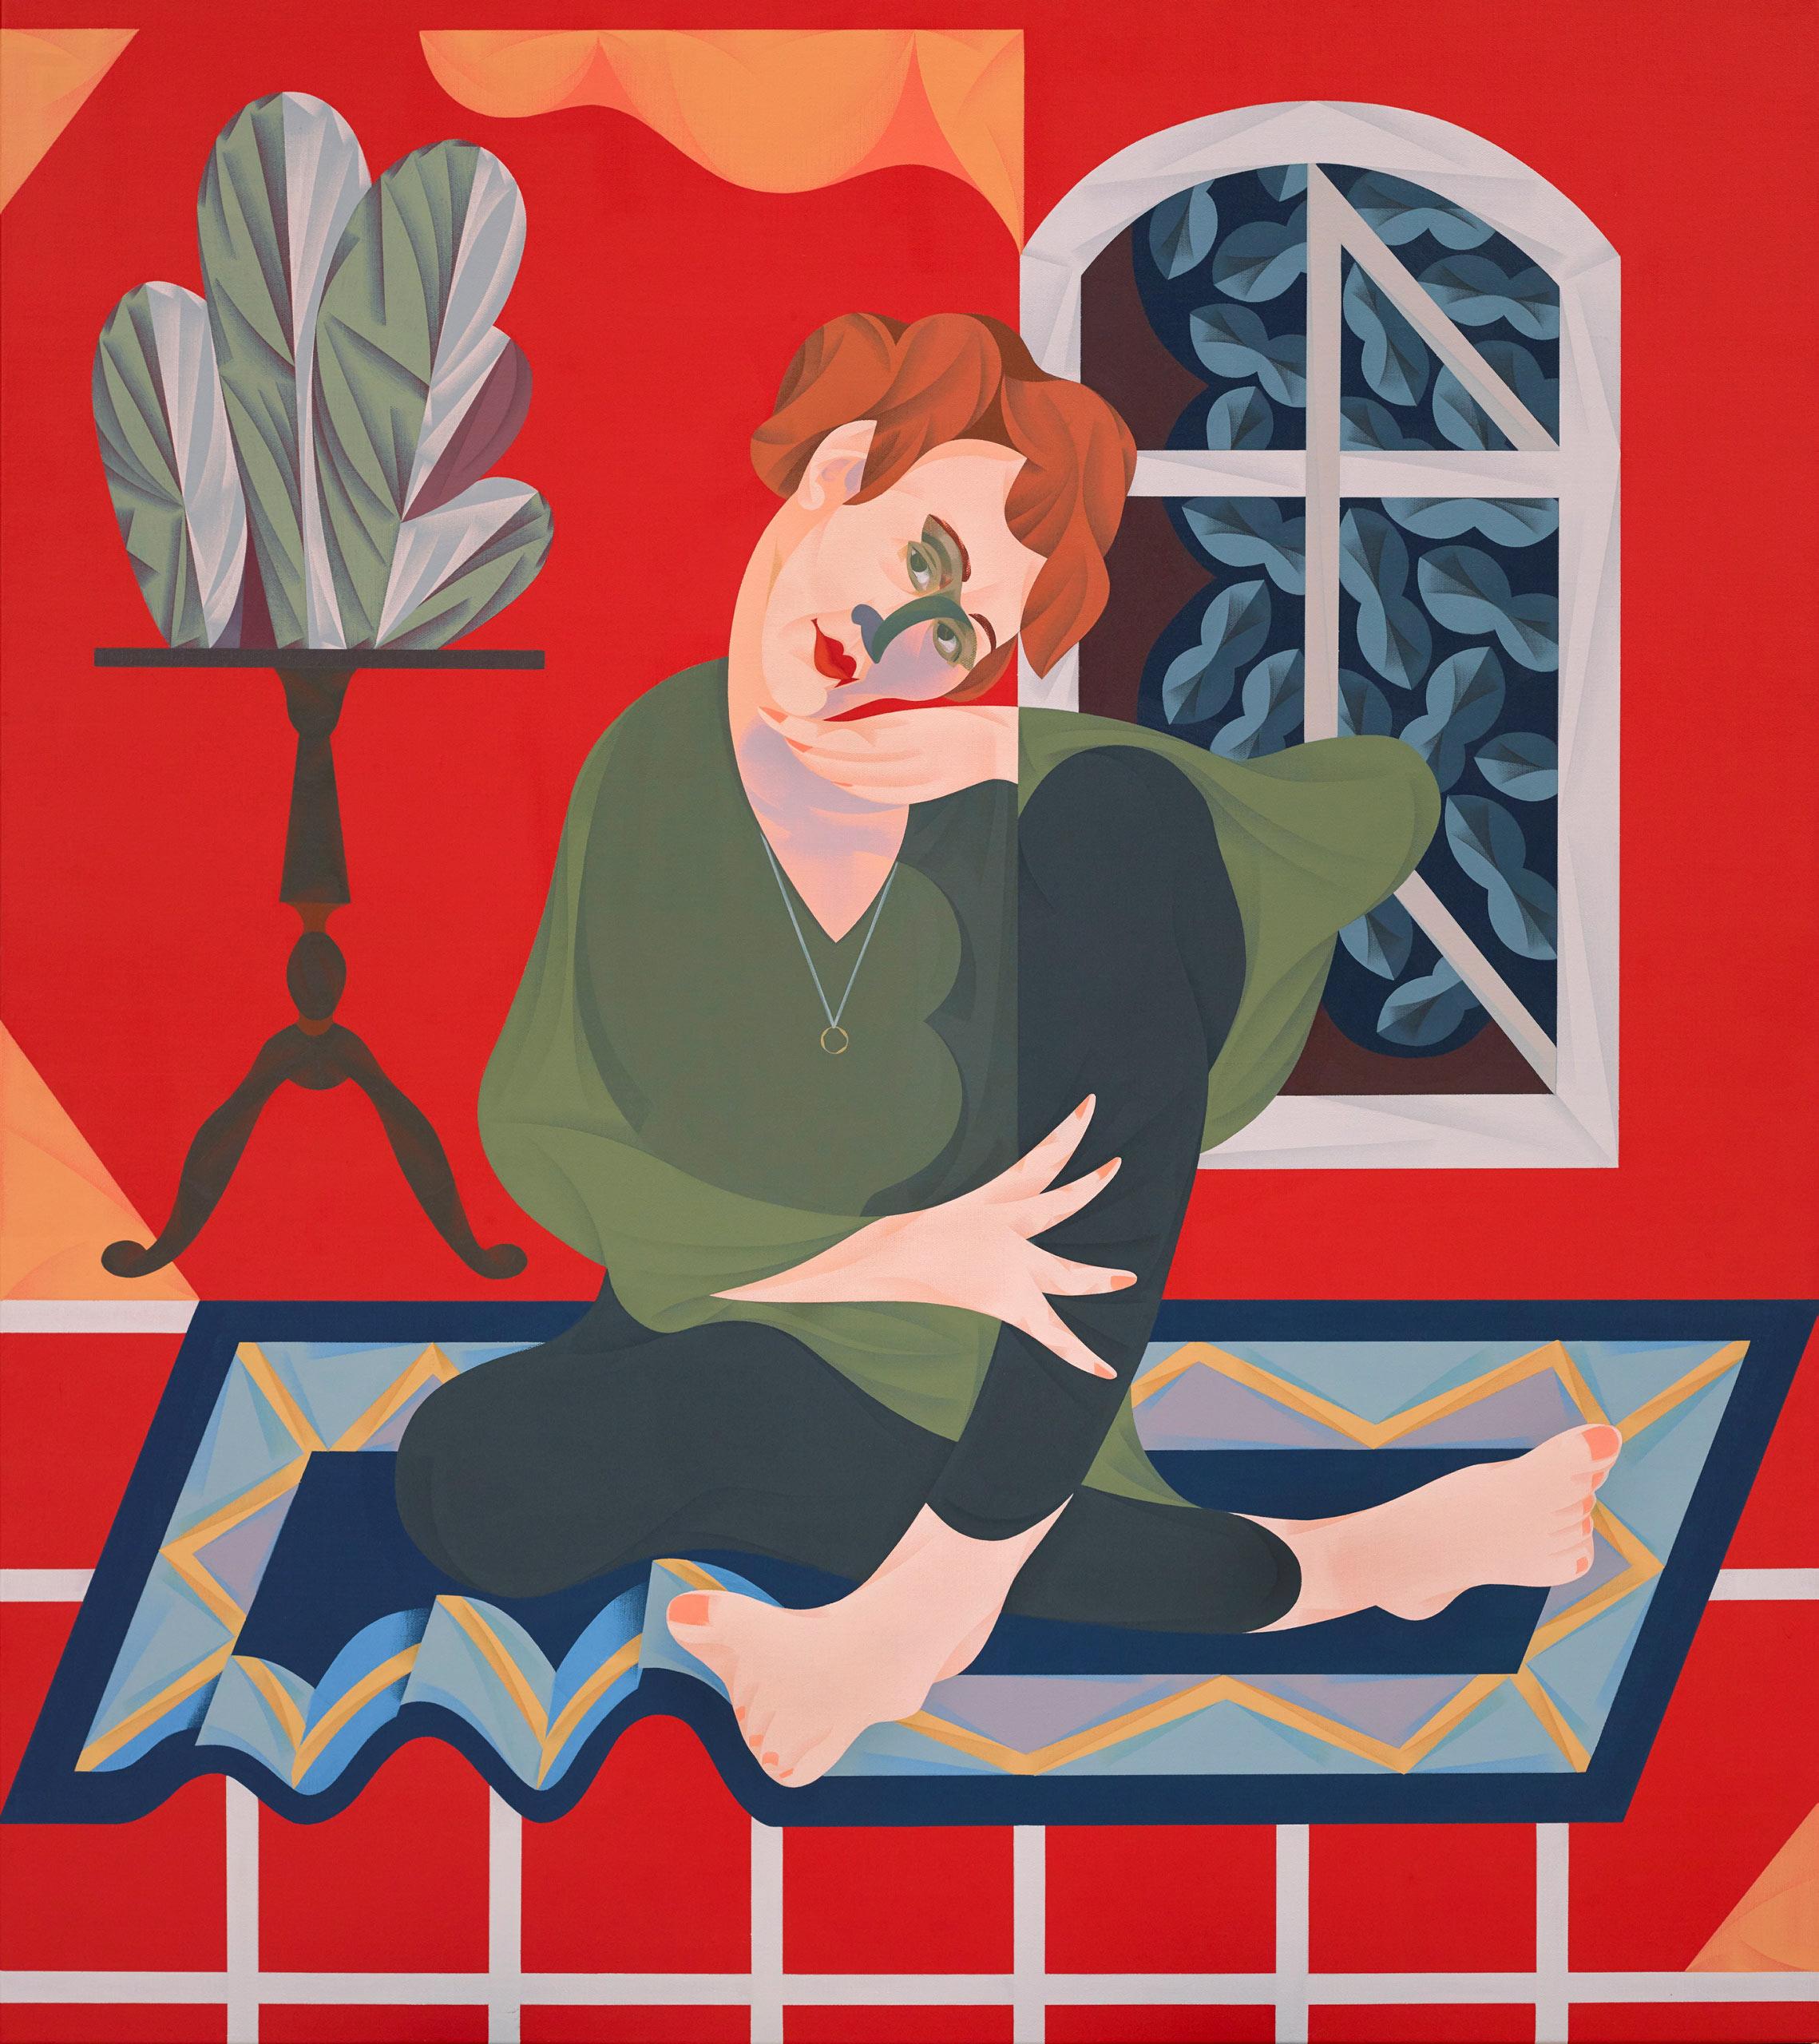 Mitch Cairns, 'Agatha Gothe-Snape', 2017 (Archibald 2017 winner)